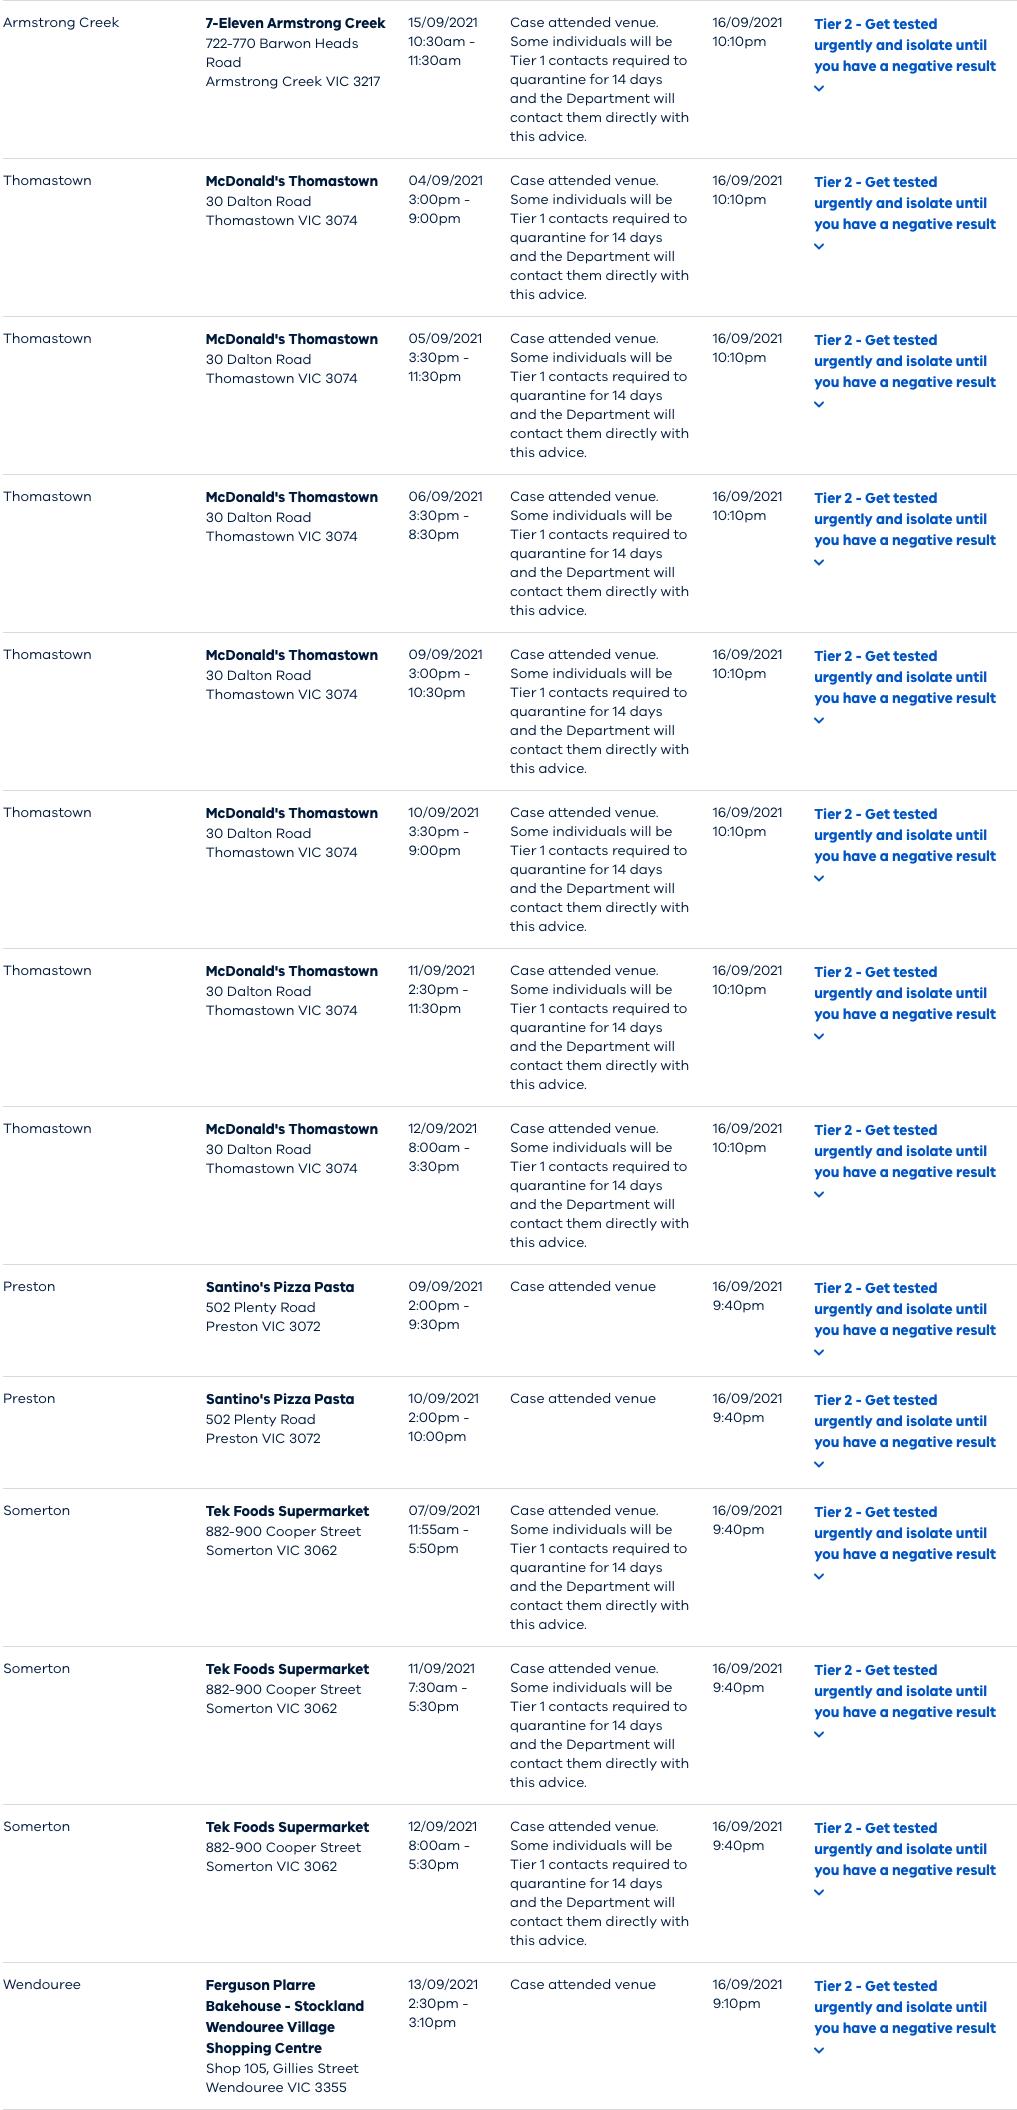 www.coronavirus.vic.gov.au_case-alerts-public-exposure-sites (1).png